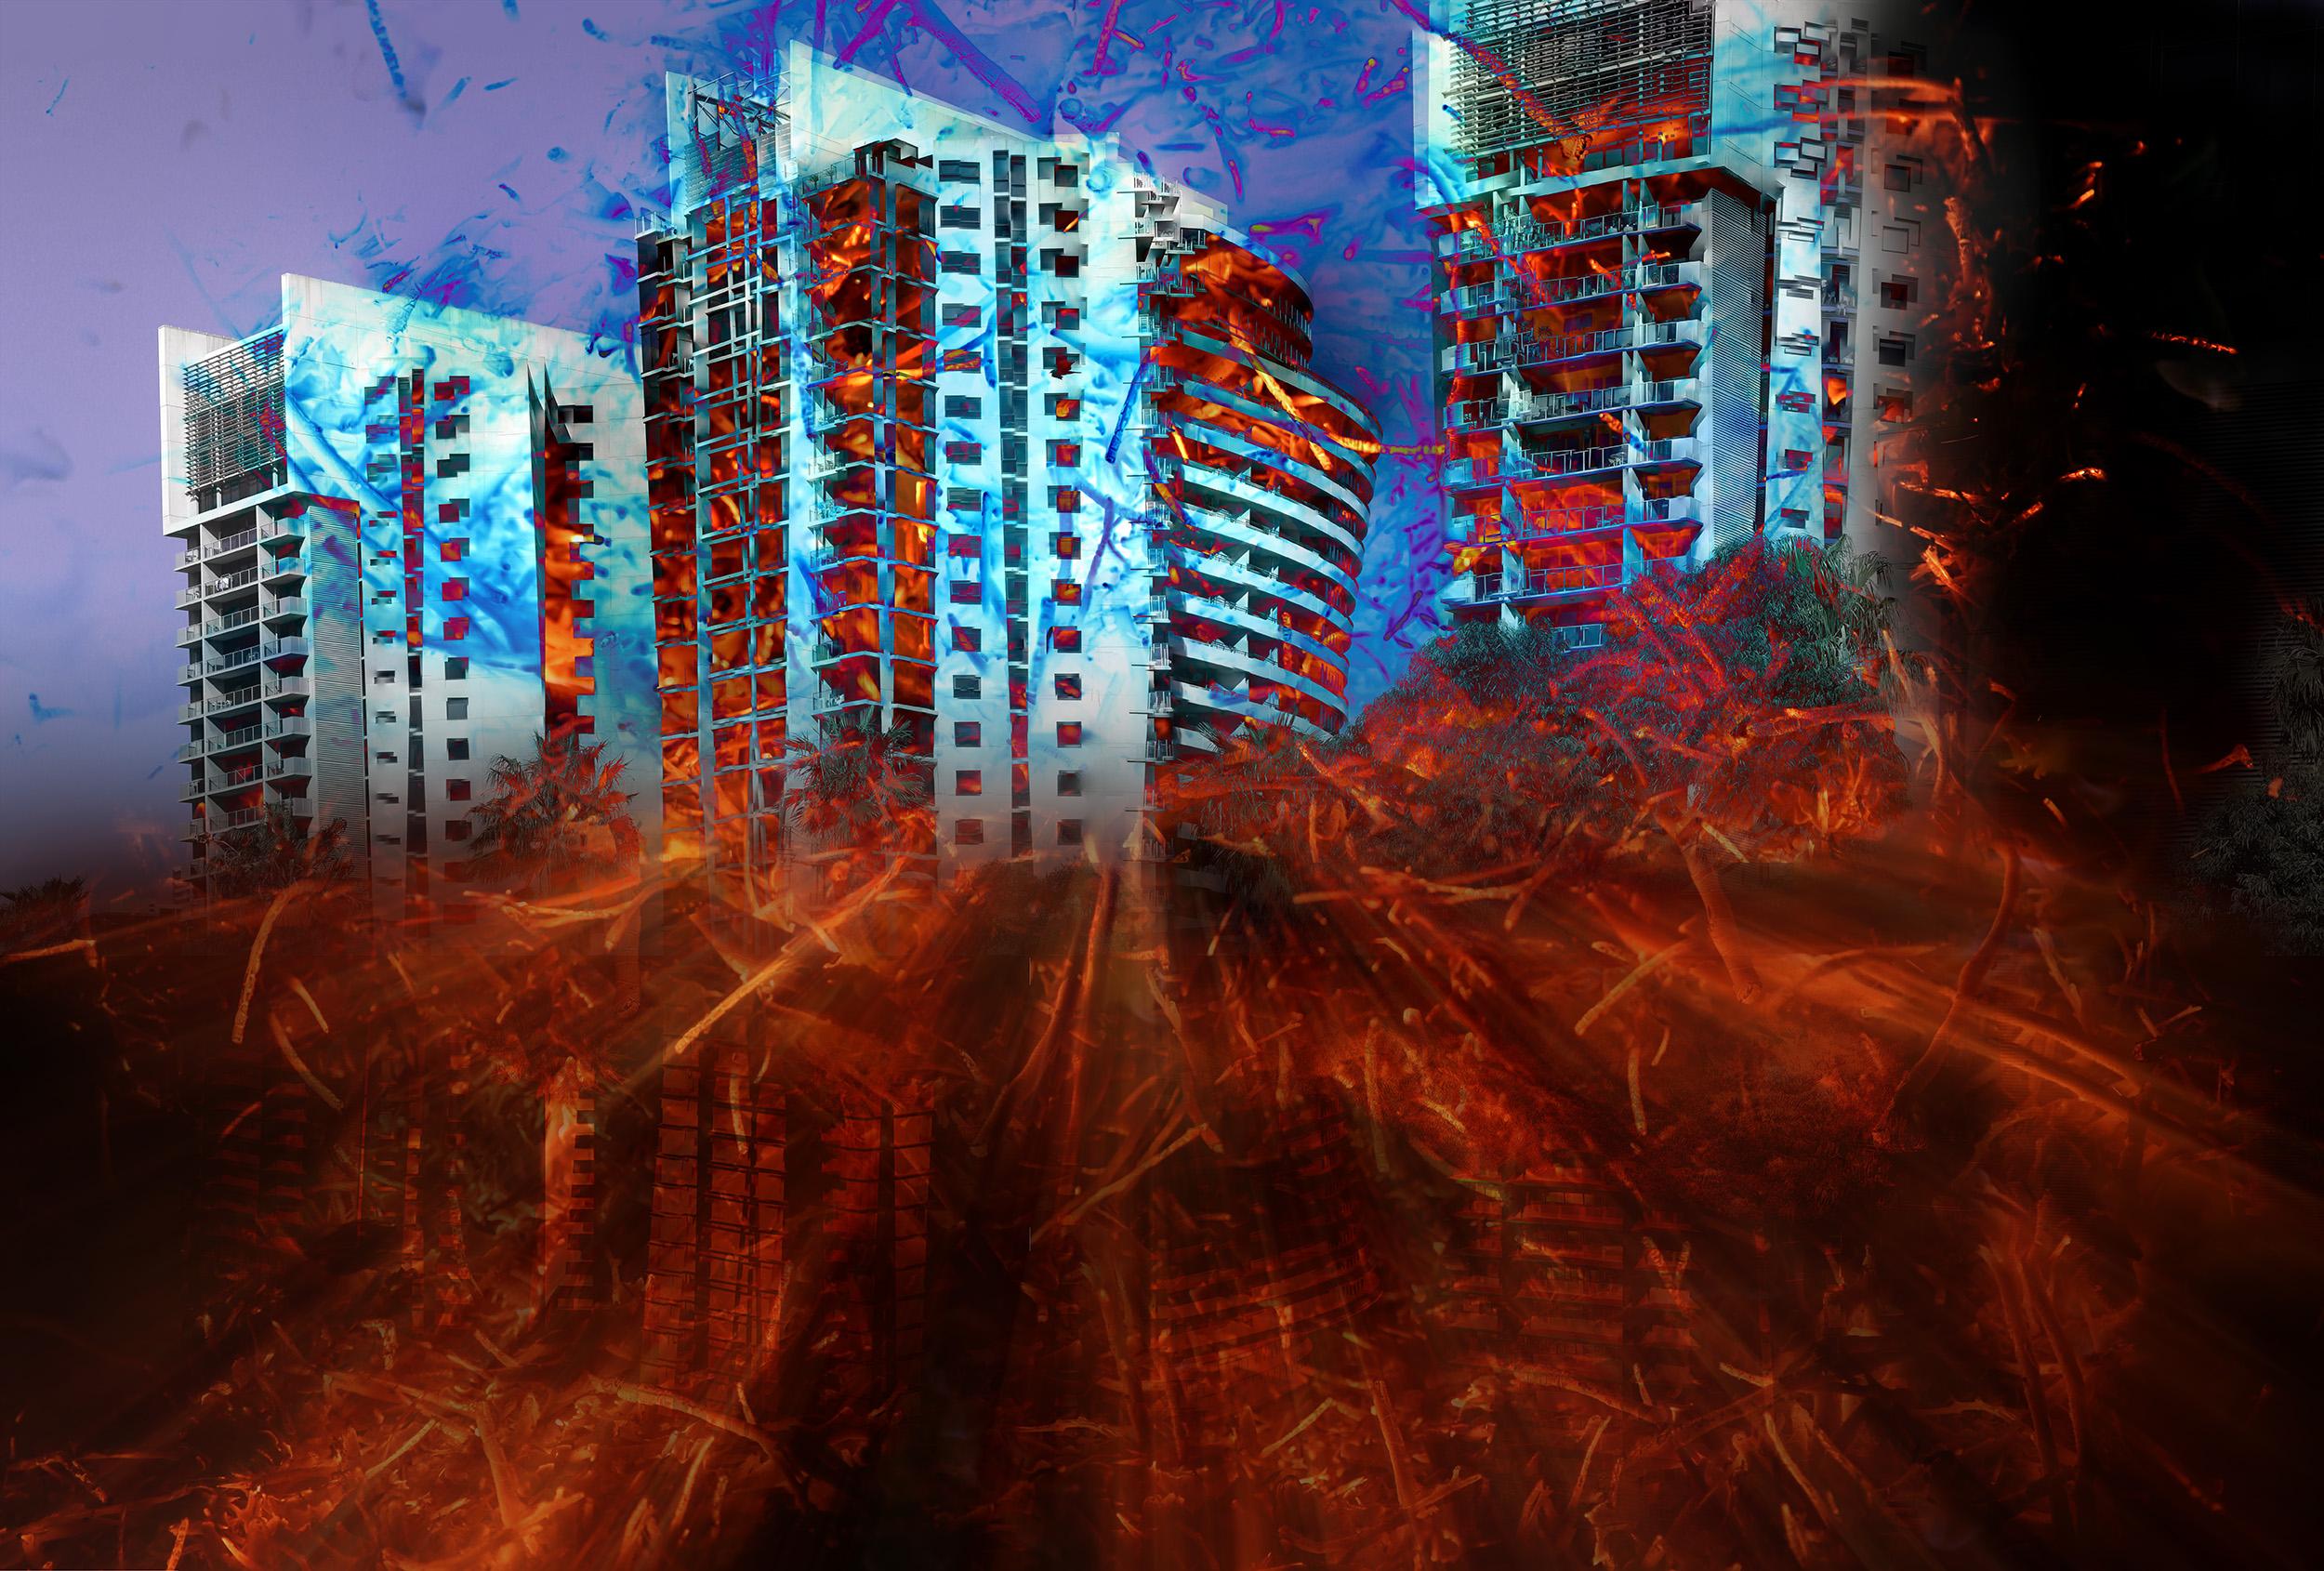 explodingCity-ss.jpg